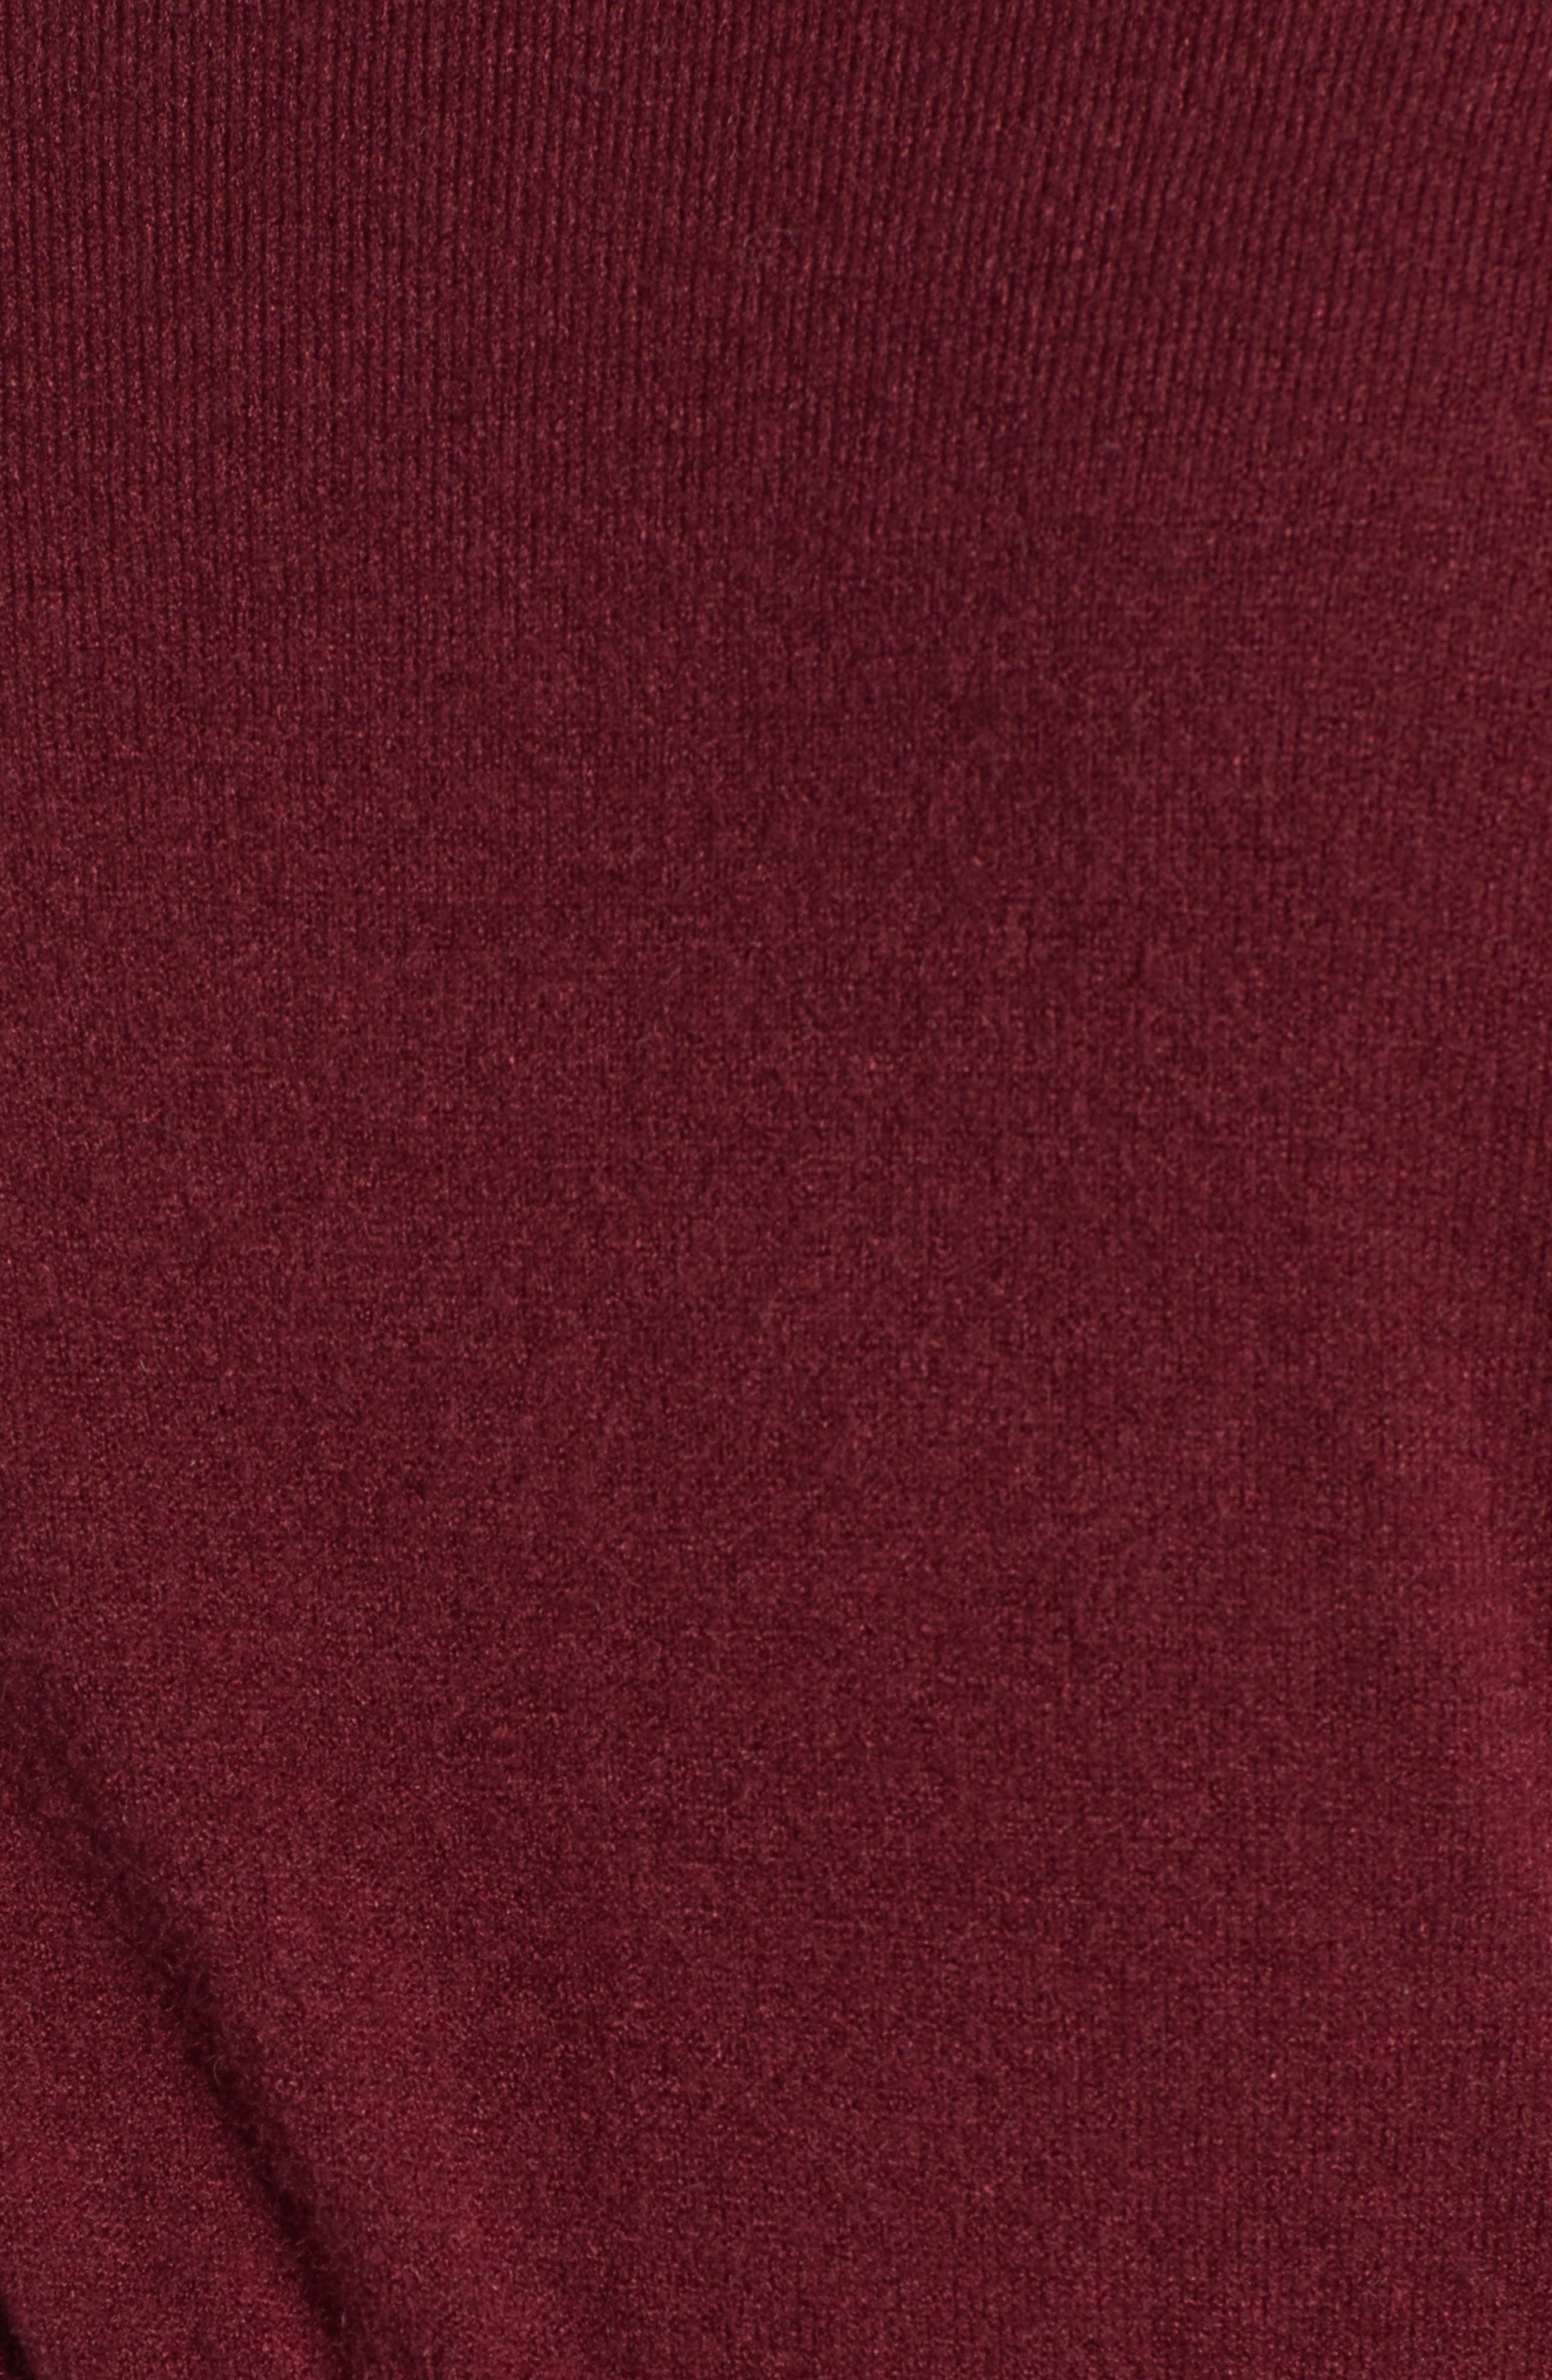 Waist Detail Off the Shoulder Sweater,                             Alternate thumbnail 5, color,                             601